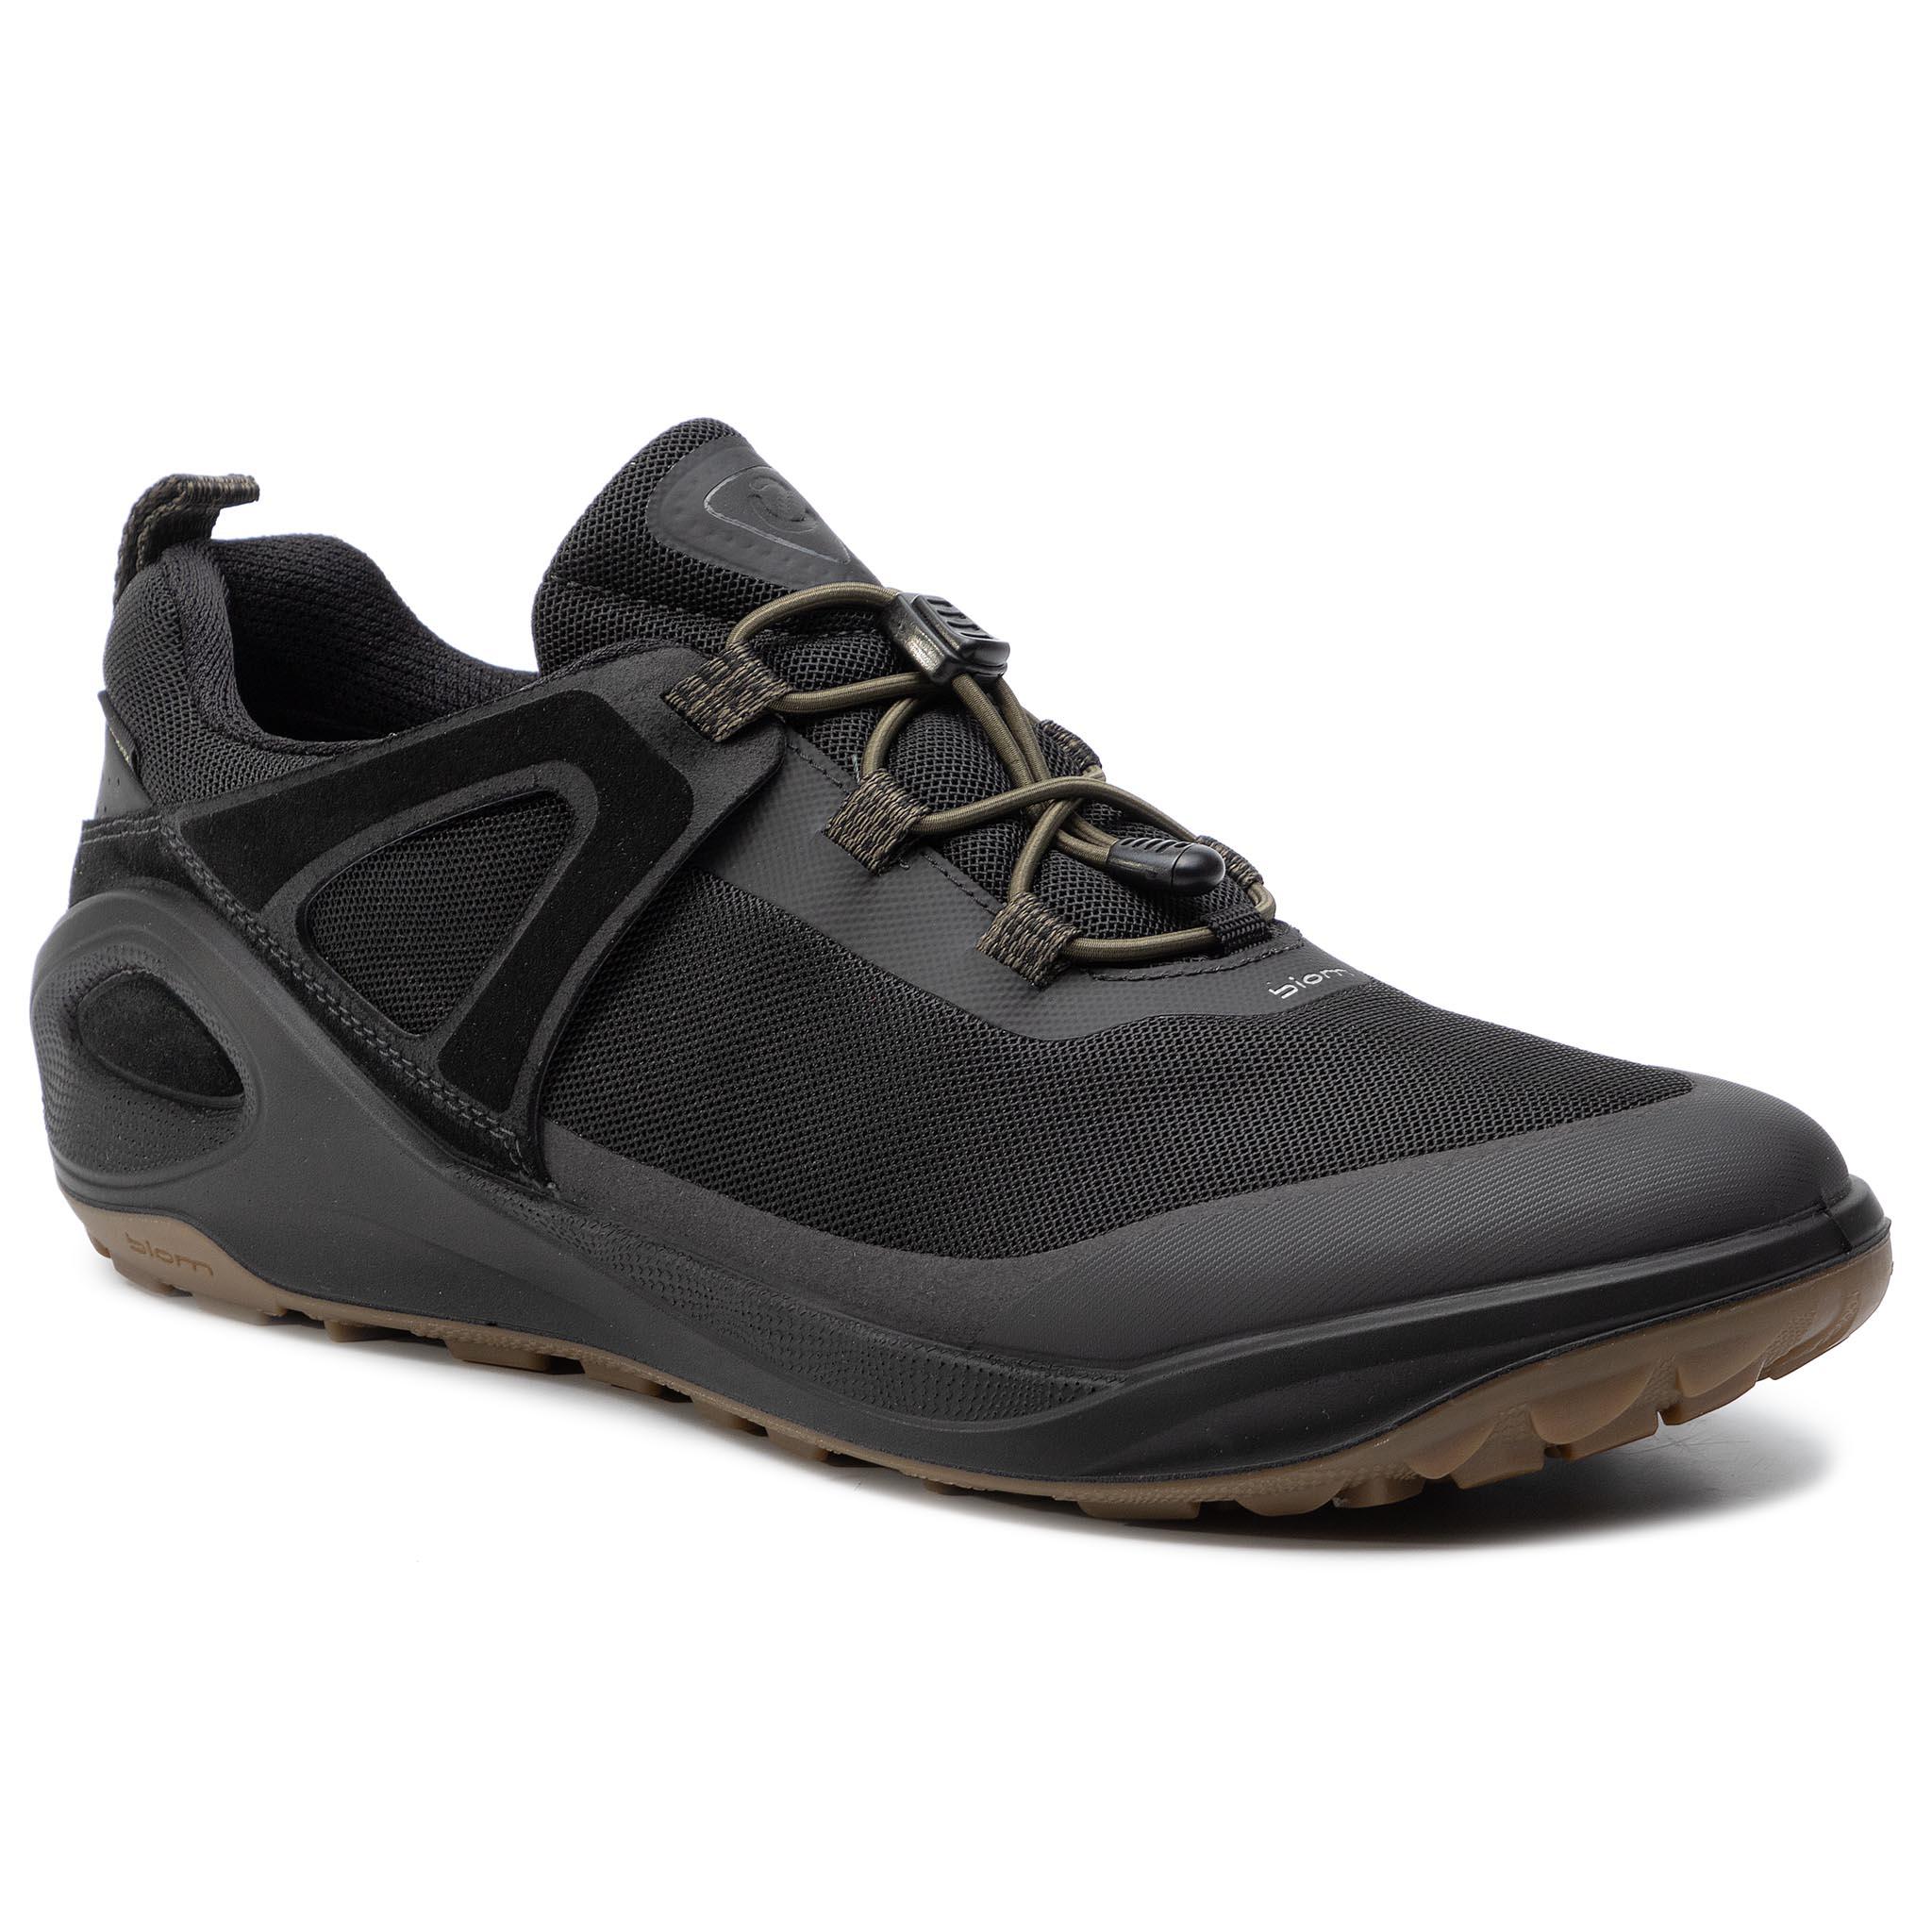 Trekingová obuv ECCO - Biom 2Go GORE-TEX 80192451602  Black/Tarmac/Black